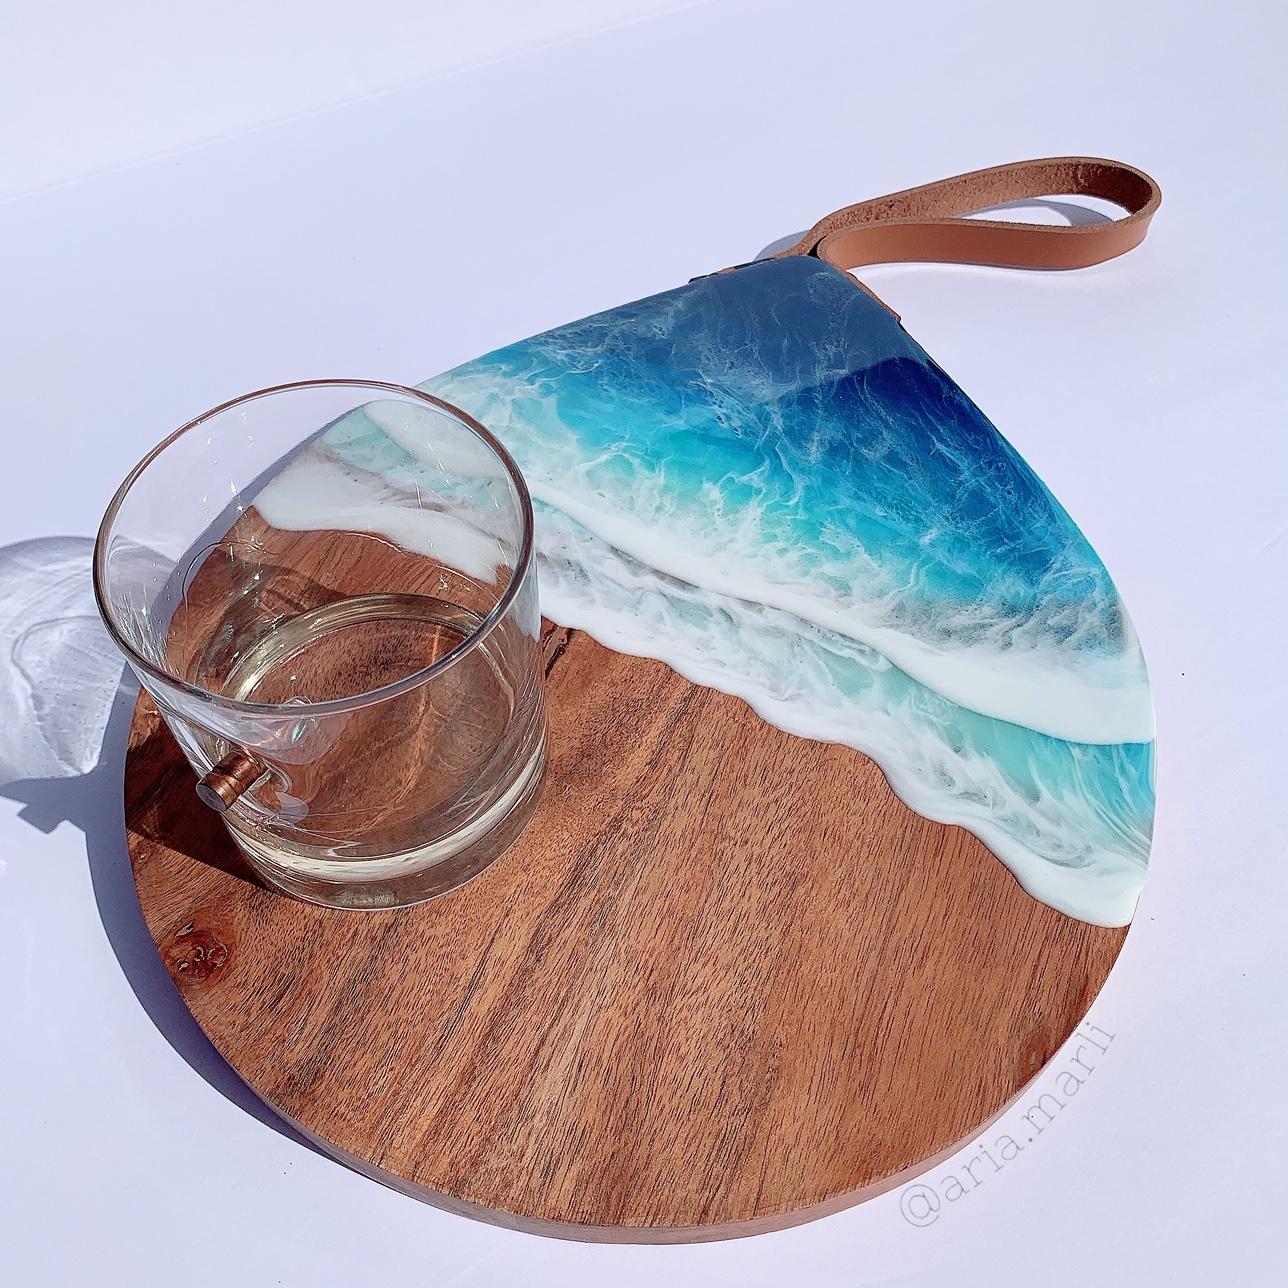 Wood serving board with ocean wave coating of resin